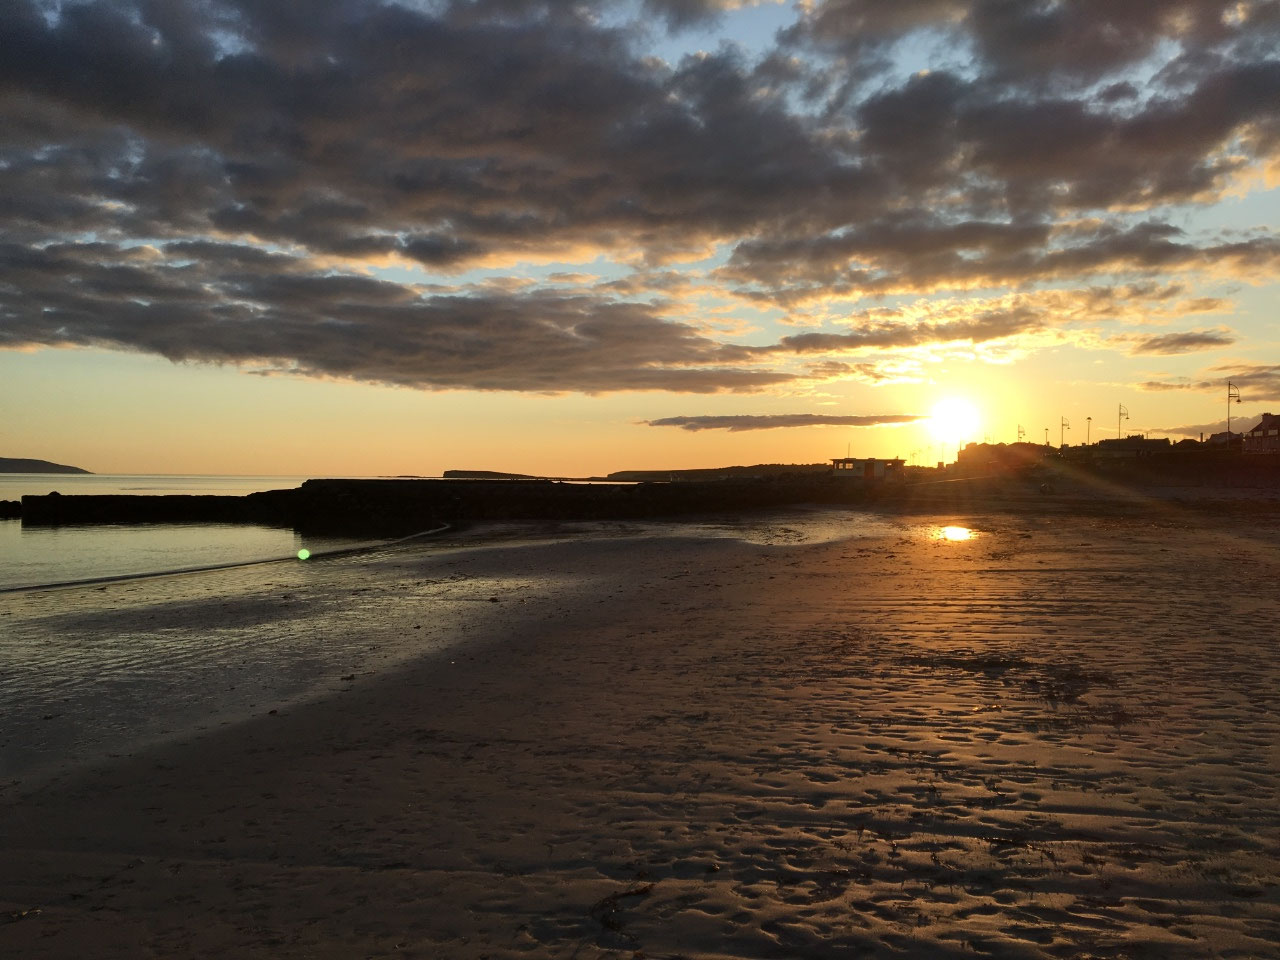 Sunset at Salthill Beach